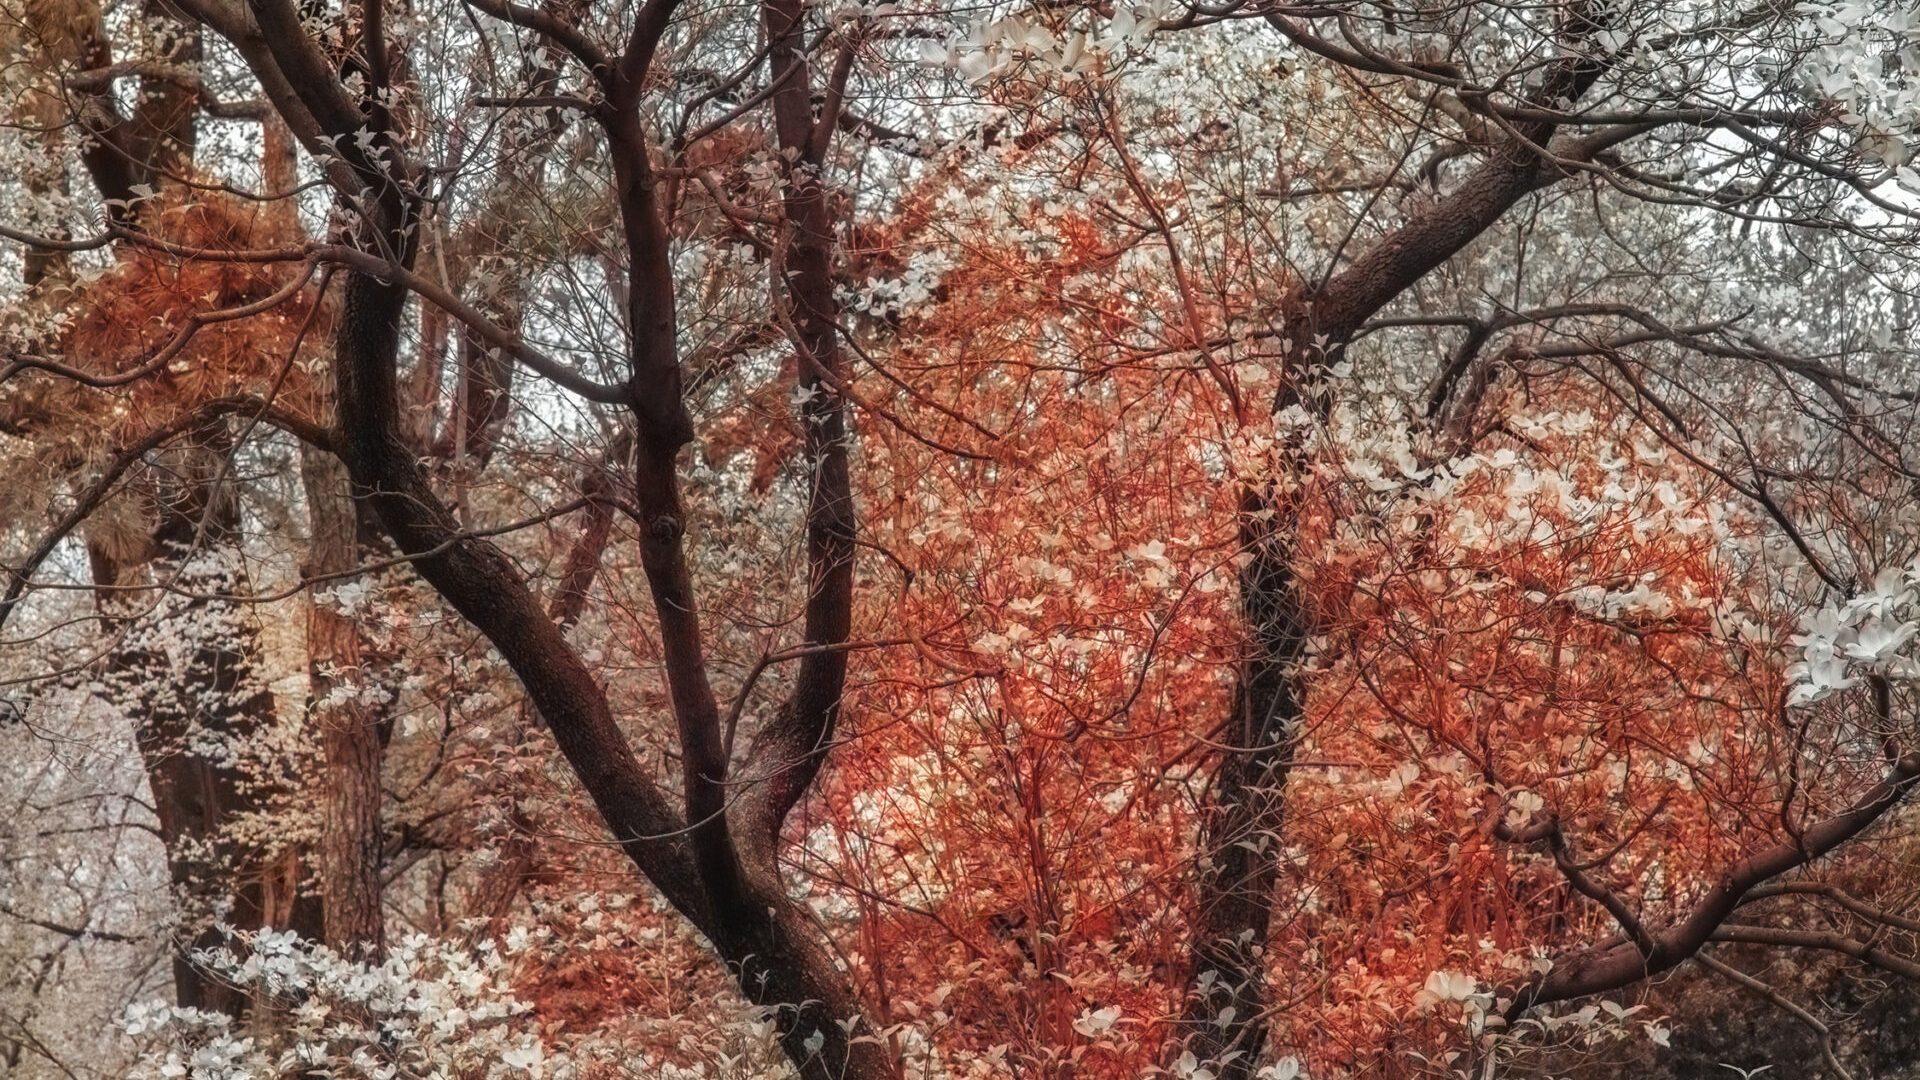 "Trevor Paglen,   Bloom (#79655d), 2020 dye sublimation print 66 cm × 49.5 cm (26"" × 19-1/2"")    Edition 1 of 5,  Edition of 5 + 2 APs,   PHOTO,   No. 75671.01,  Alt # 399,   format of photography: digital,  source of photography: Trevor Paglen Studio"